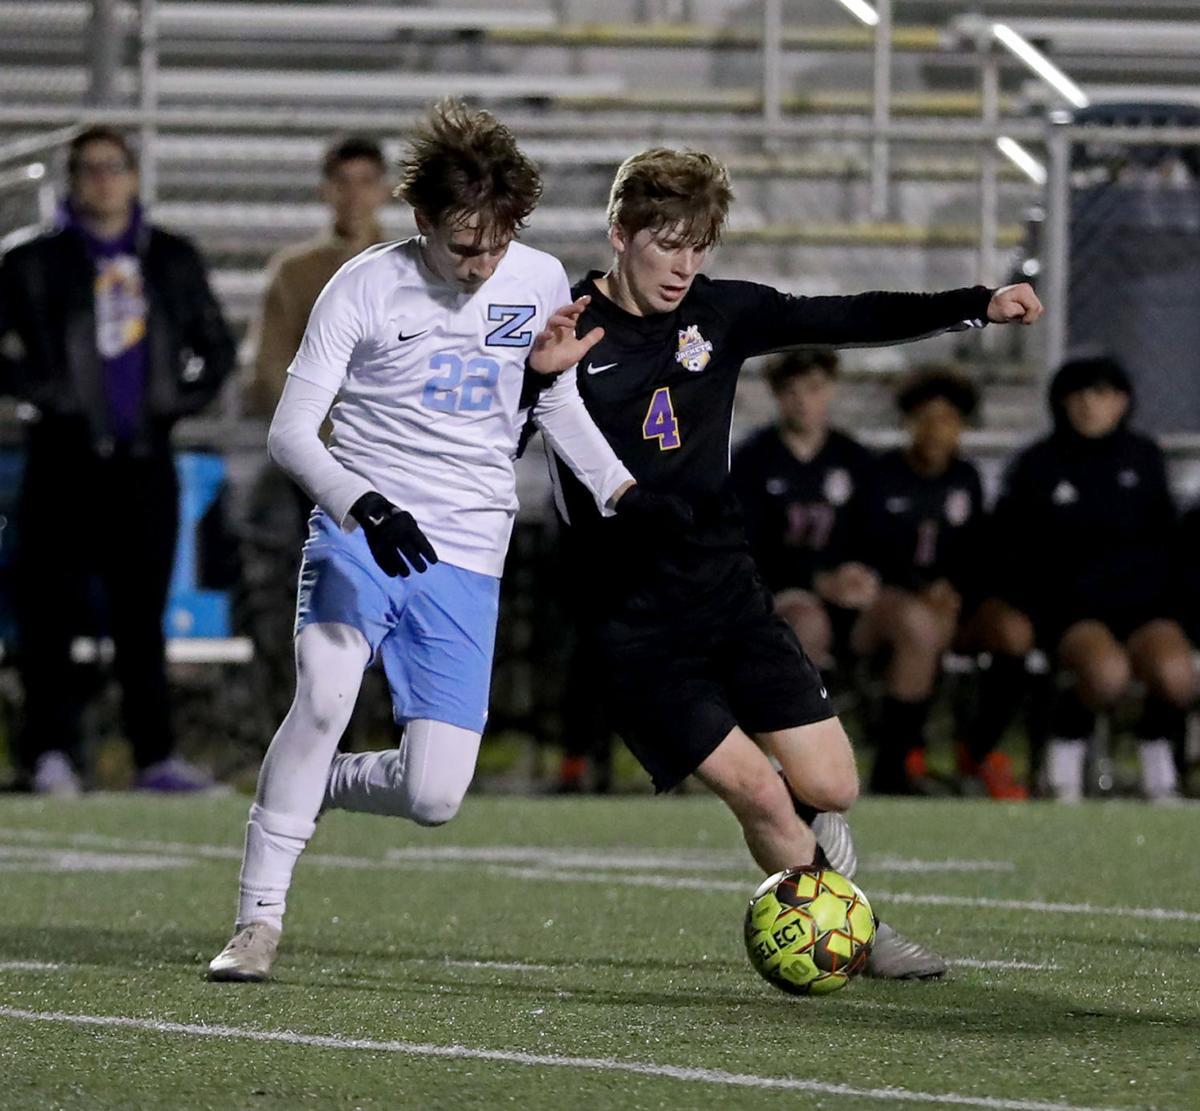 Zachary-DSHS-b-soccer_Brennan Amato, Addison Gee